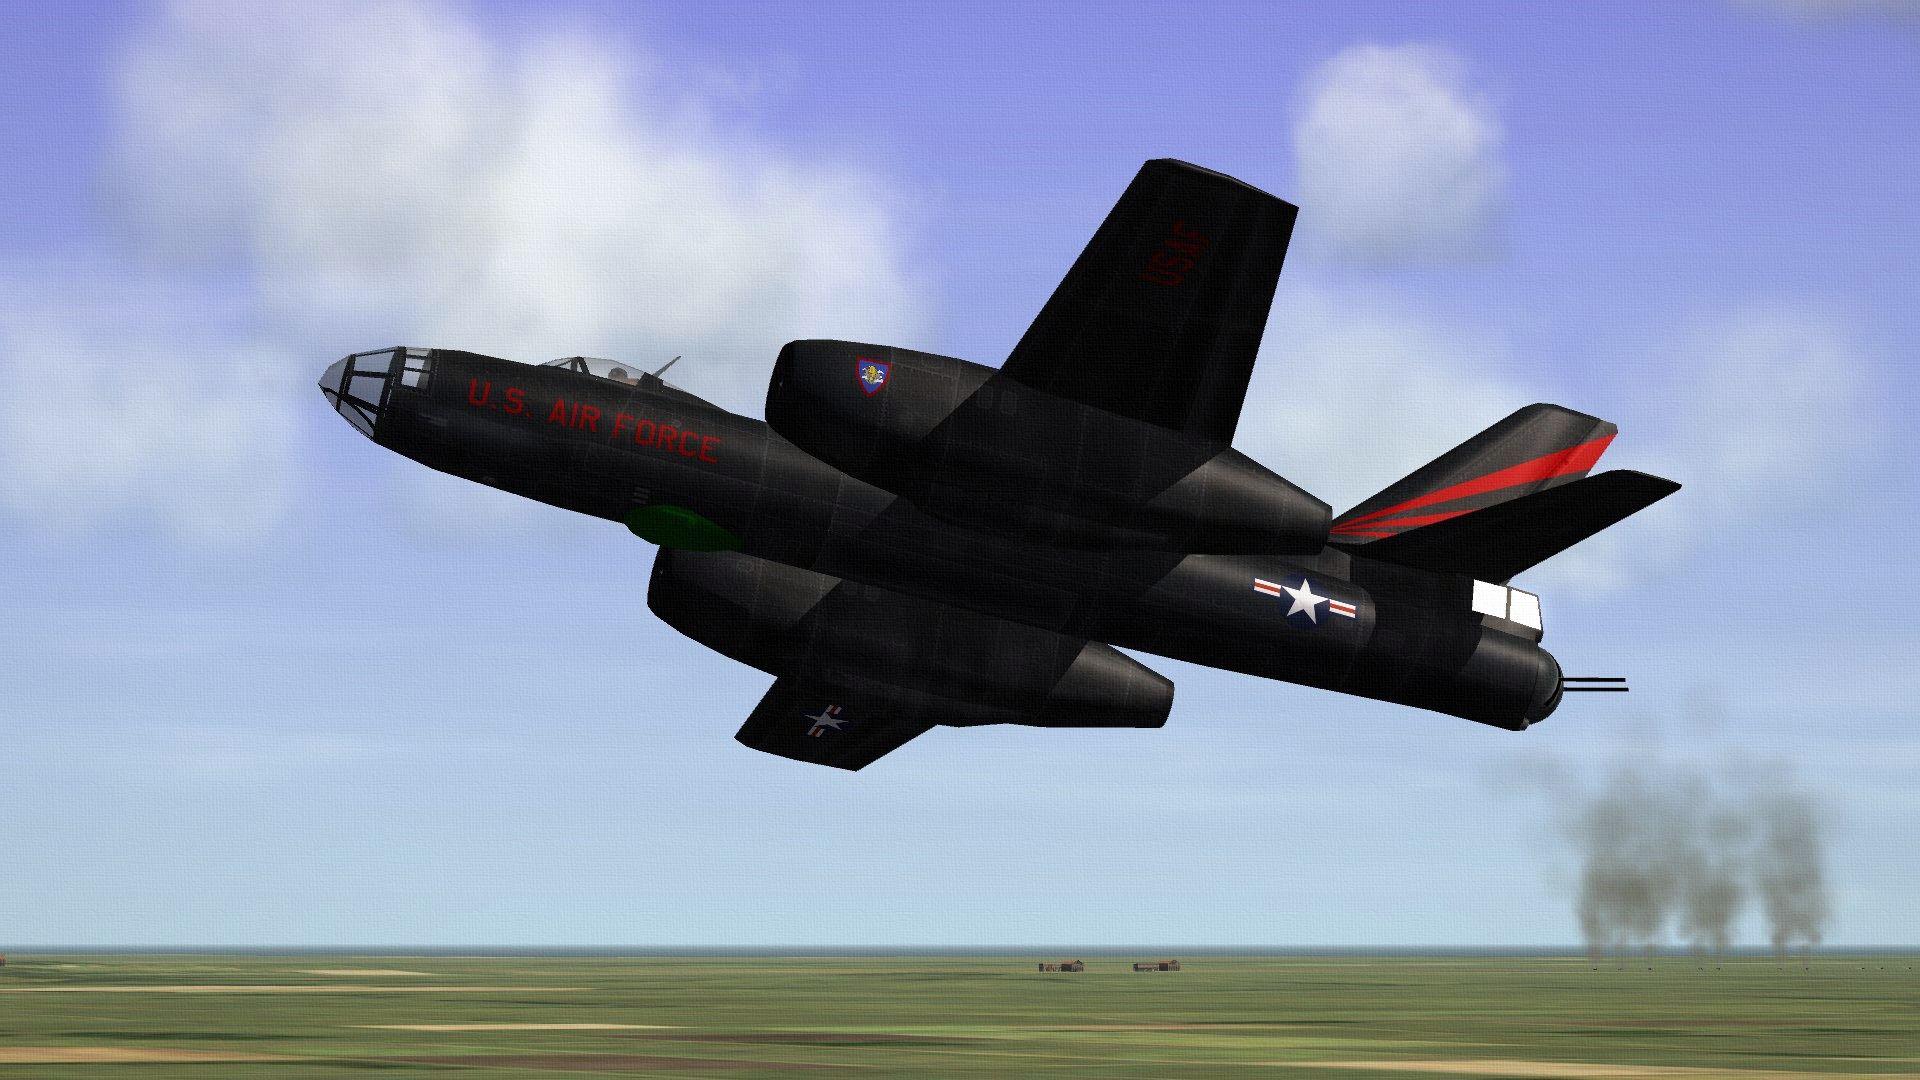 USAFB-53CCOUGAR07_zps4461928e.jpg